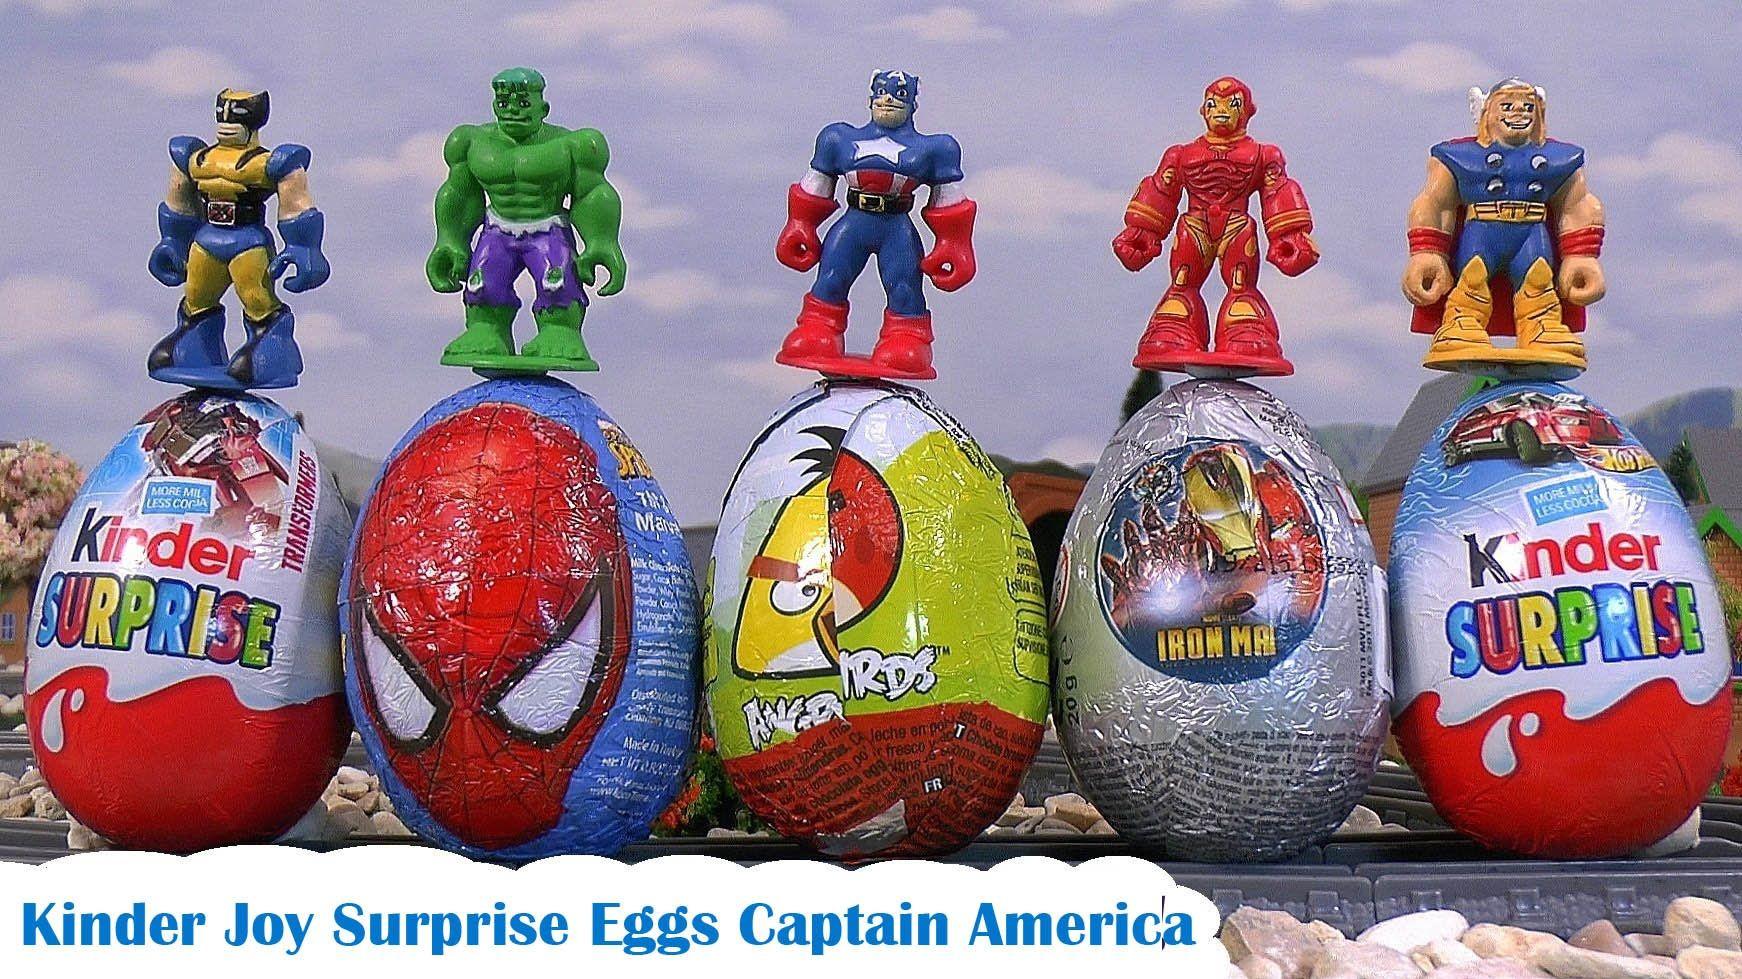 Kinder Joy Surprise Eggs Marvel Captain America, Surpreenda Ovos Capitão América by TBTC https://www.youtube.com/watch?v=UskdPnLNlQI https://www.youtube.com/watch?v=MISre2CI5M8 https://www.youtube.com/watch?v=qoc9ssUdoFU https://www.youtube.com/watch?v=J-sb6tNQIQc https://www.youtube.com/channel/UCMA-tq_JQcZ7hg9QeXNHE9A